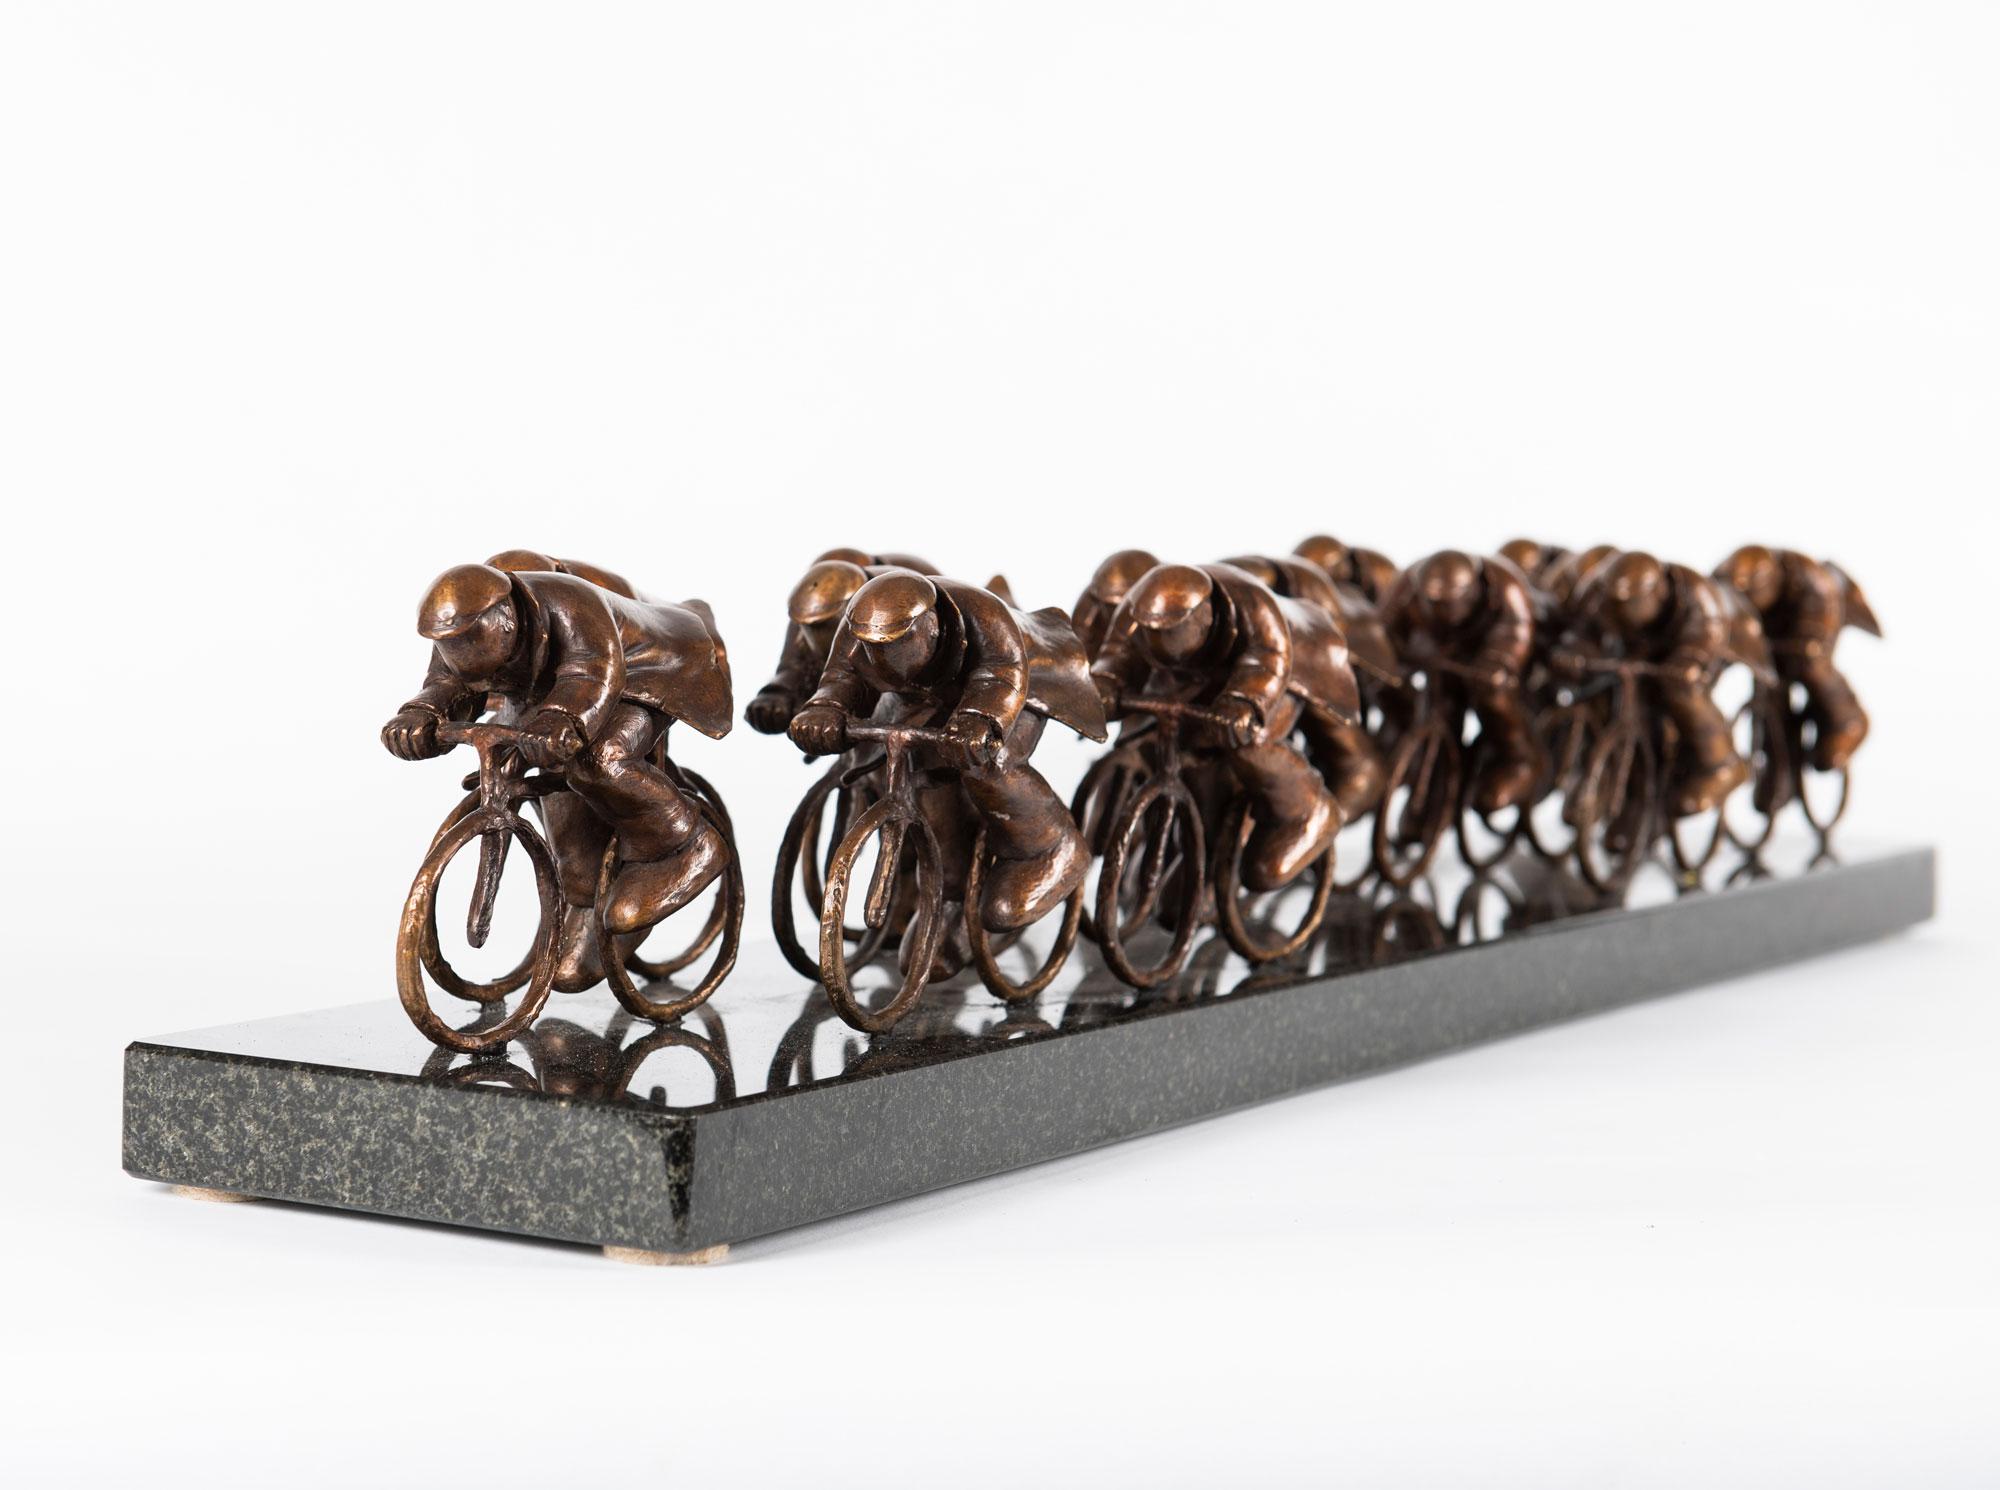 The Race bronze sculpture by Mackenzie Thorpe